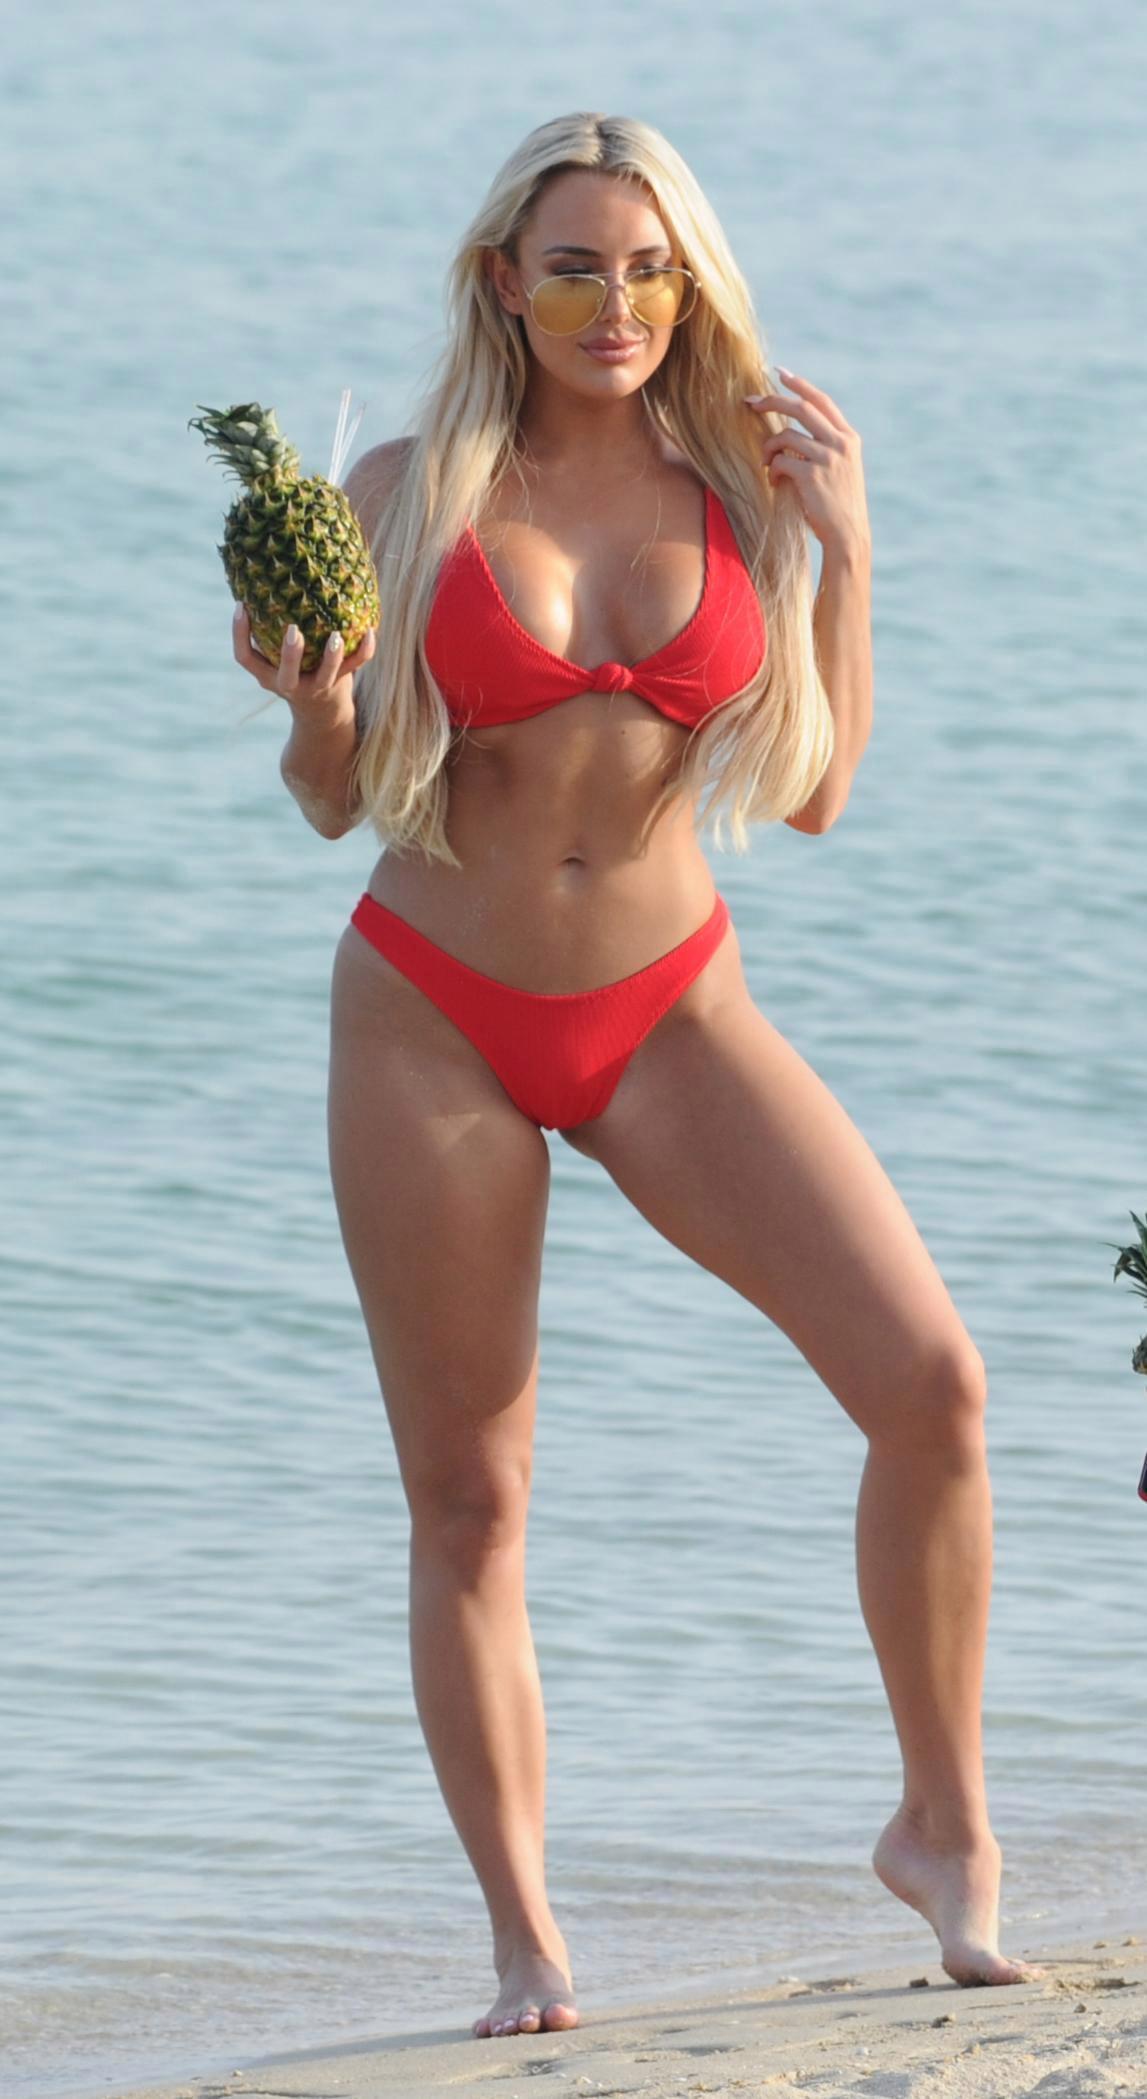 Amber Turner nudes (43 photos), photo Erotica, iCloud, butt 2020